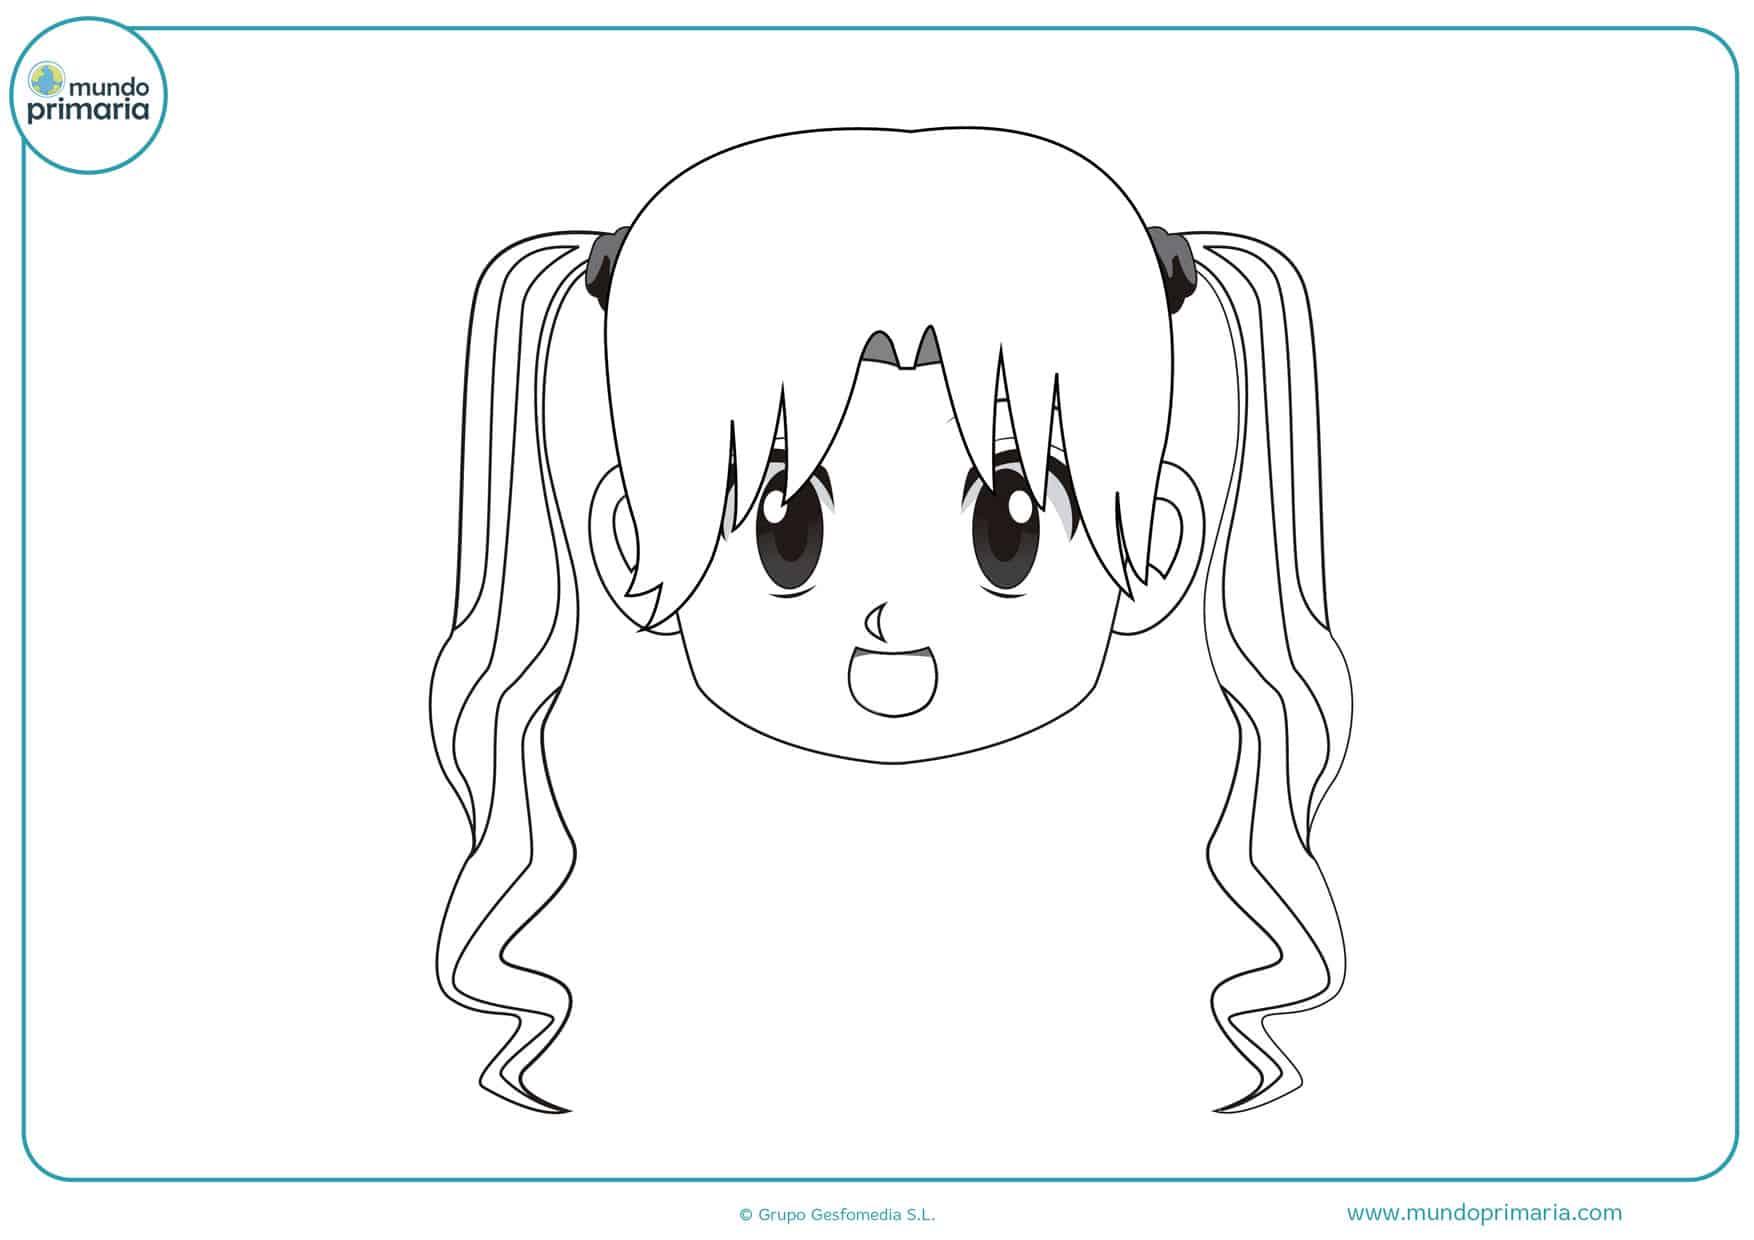 imágenes de muñecas manga para colorear